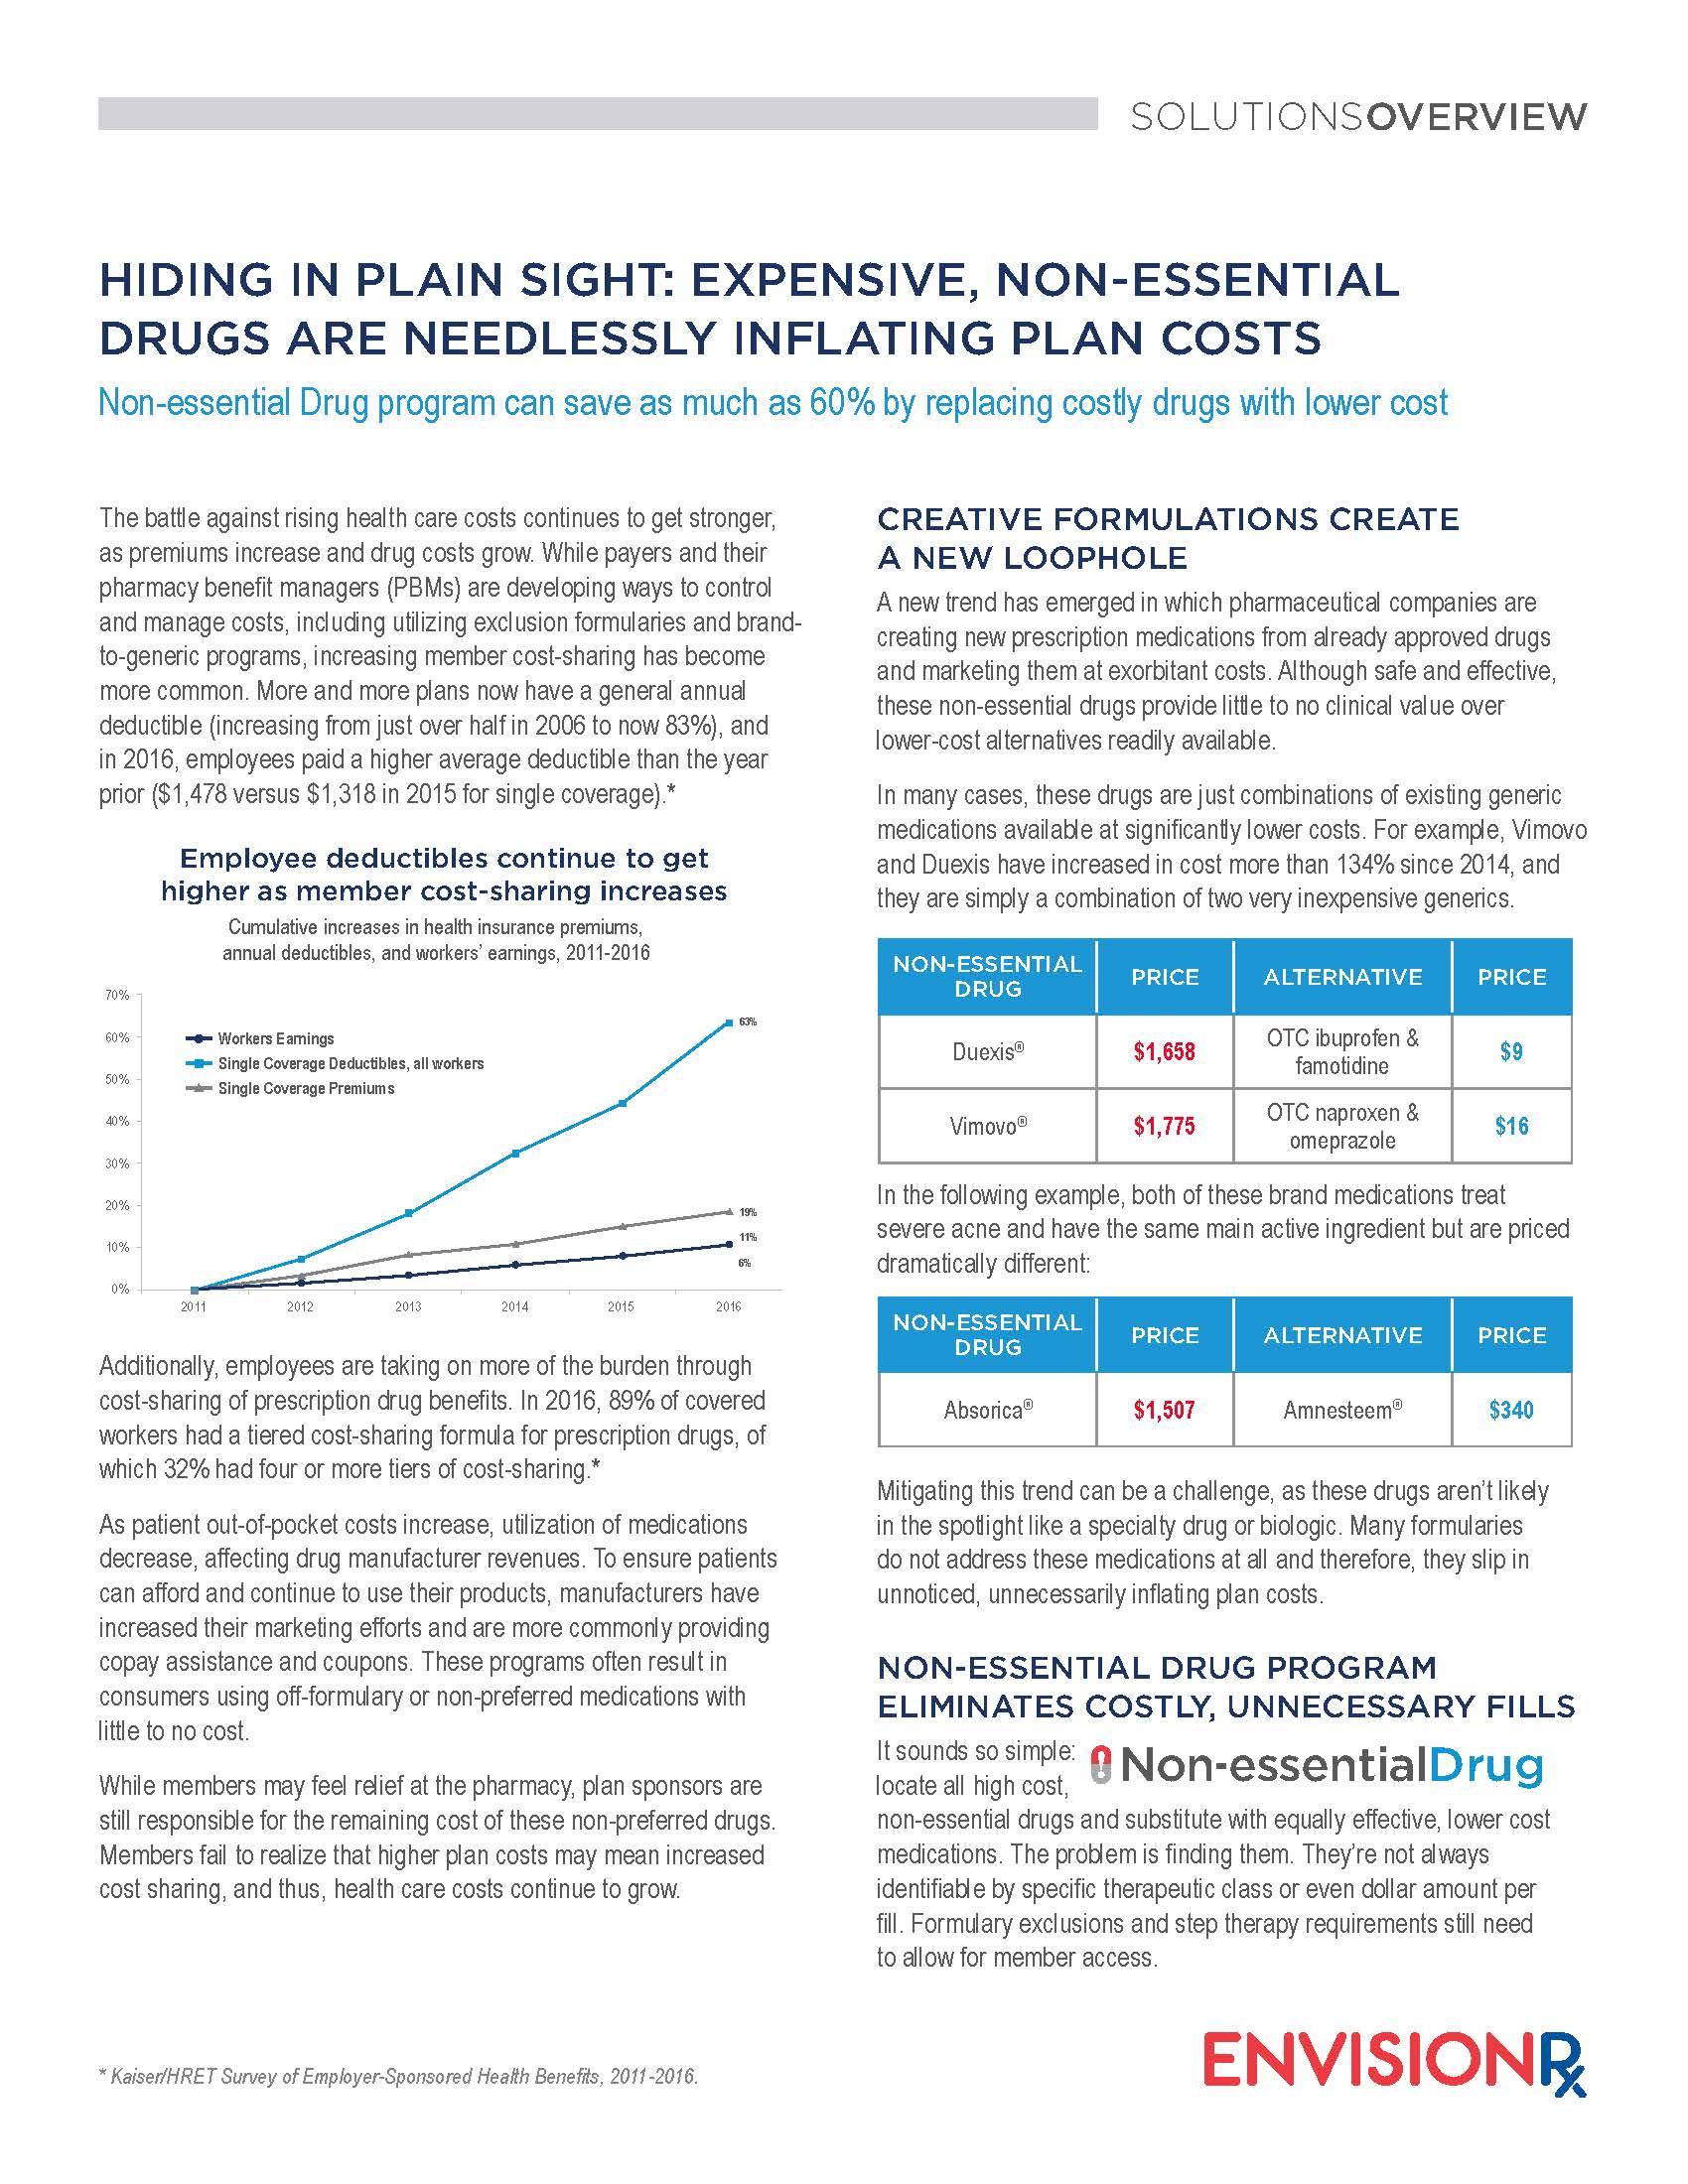 erx_non-essential drug_solutionsheet_program_17-1282_f10_Page_1